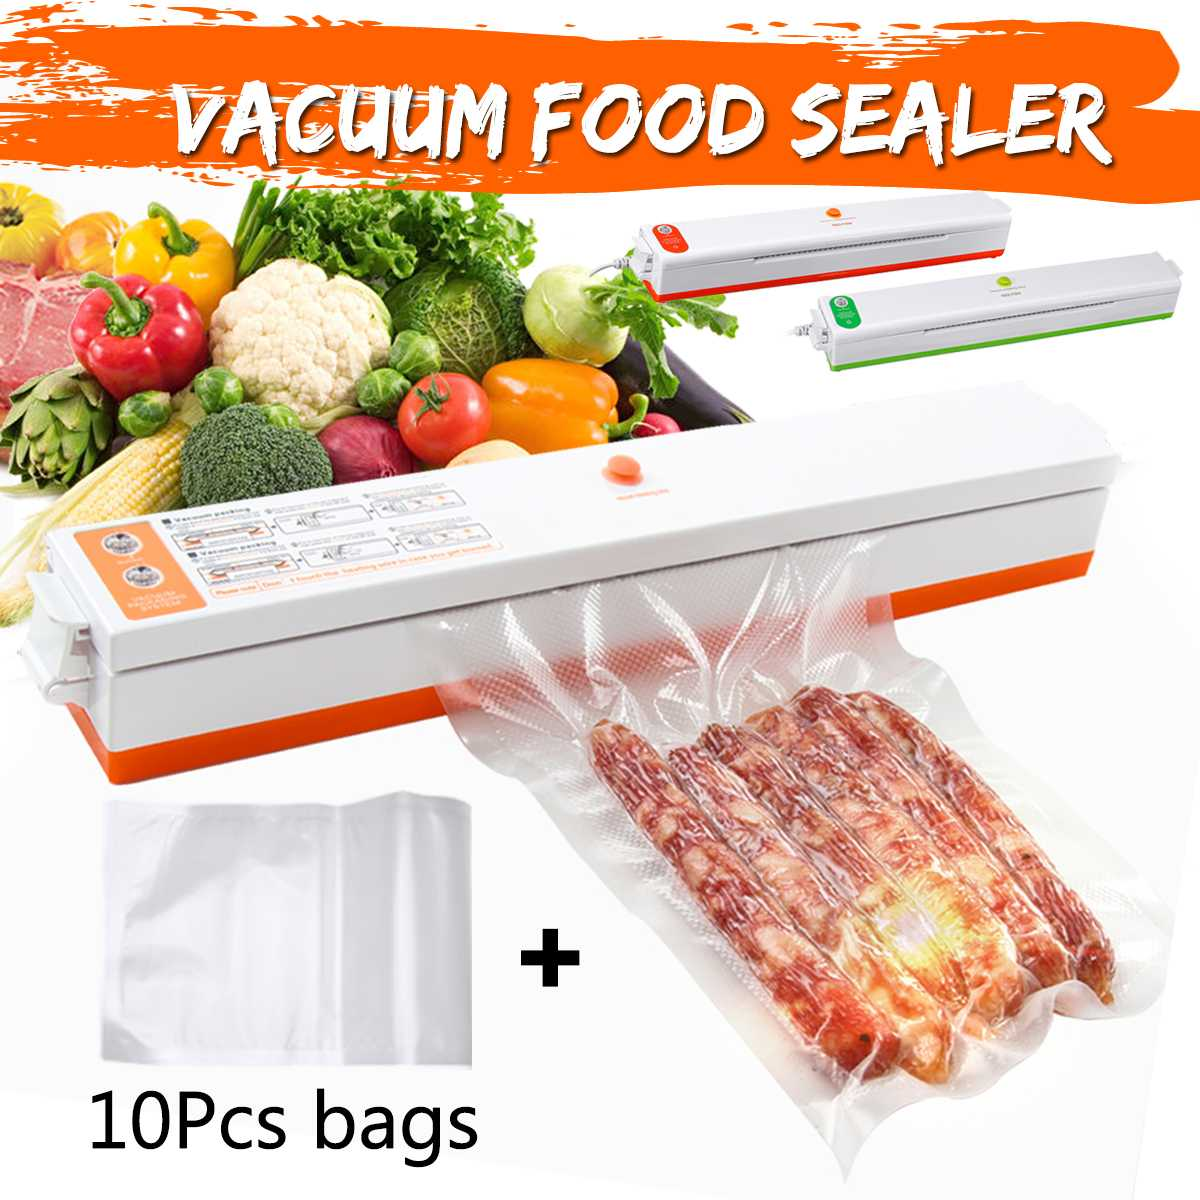 Household Food Sealer Saver 220V Vacuum Food Sealer Machine Vacuum Sealing Machine Film Container Include With Vacuum Packer